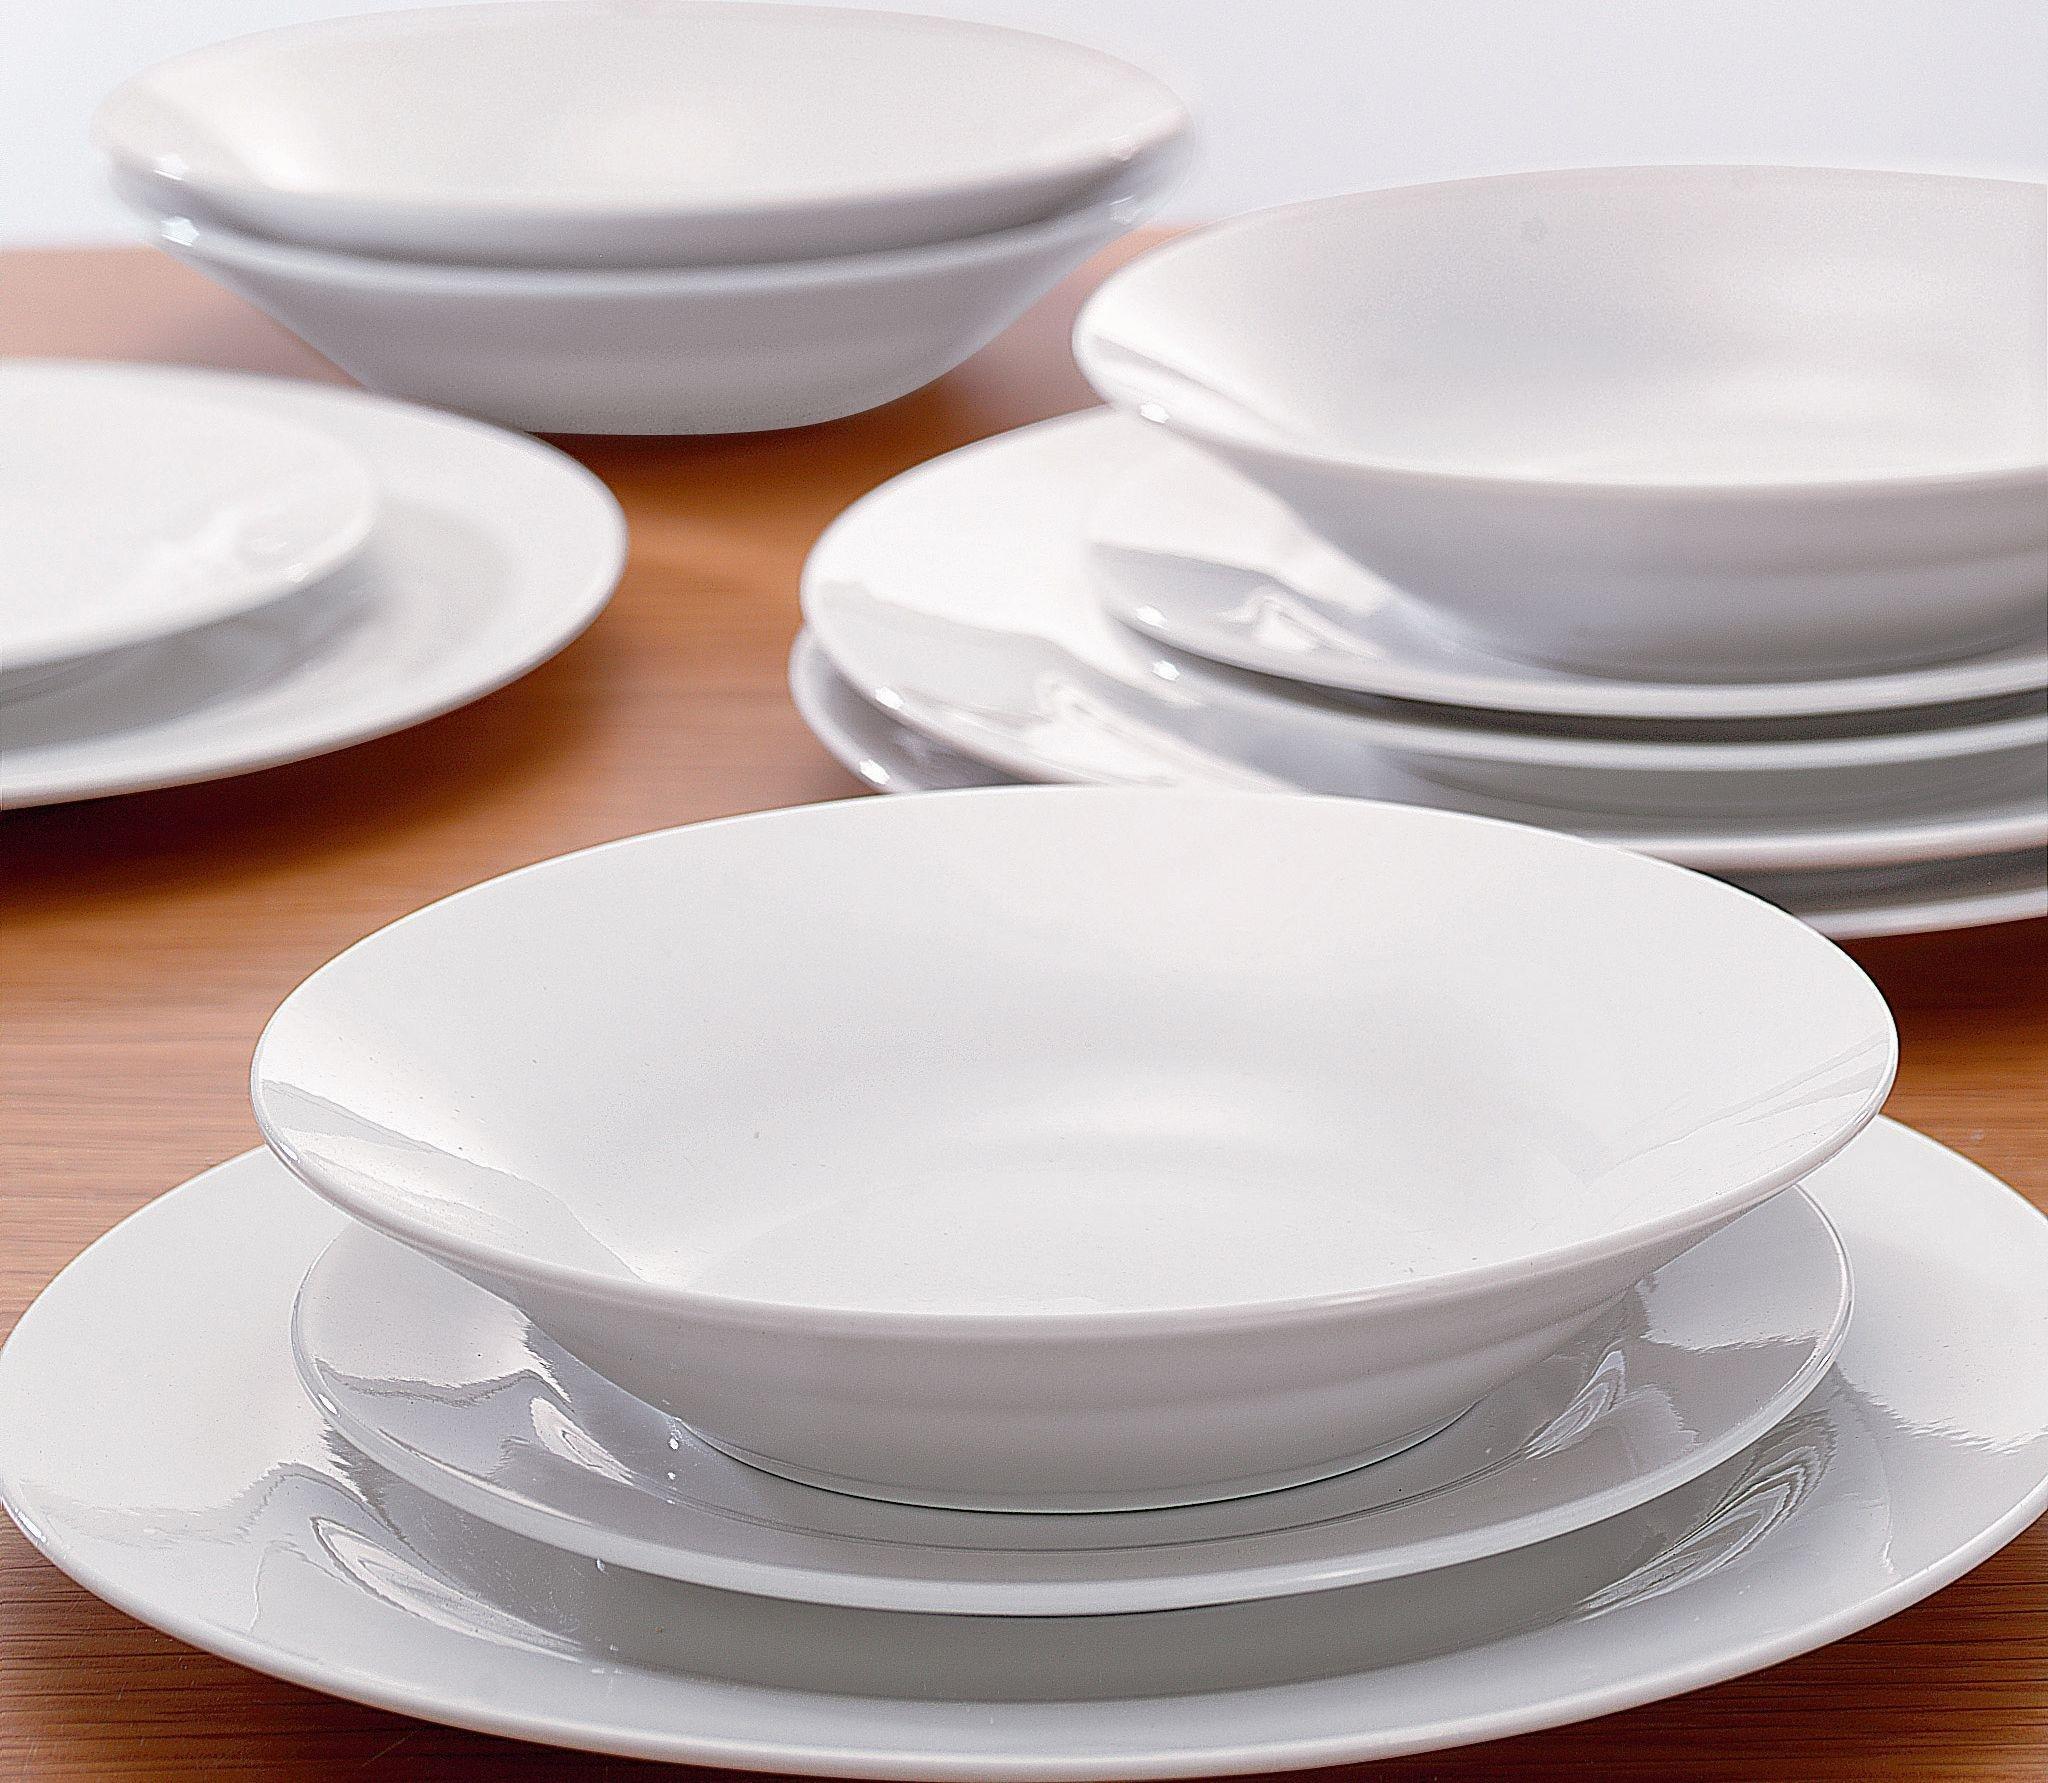 Buy Simple Value 12 Piece Porcelain Dinner Set White At .